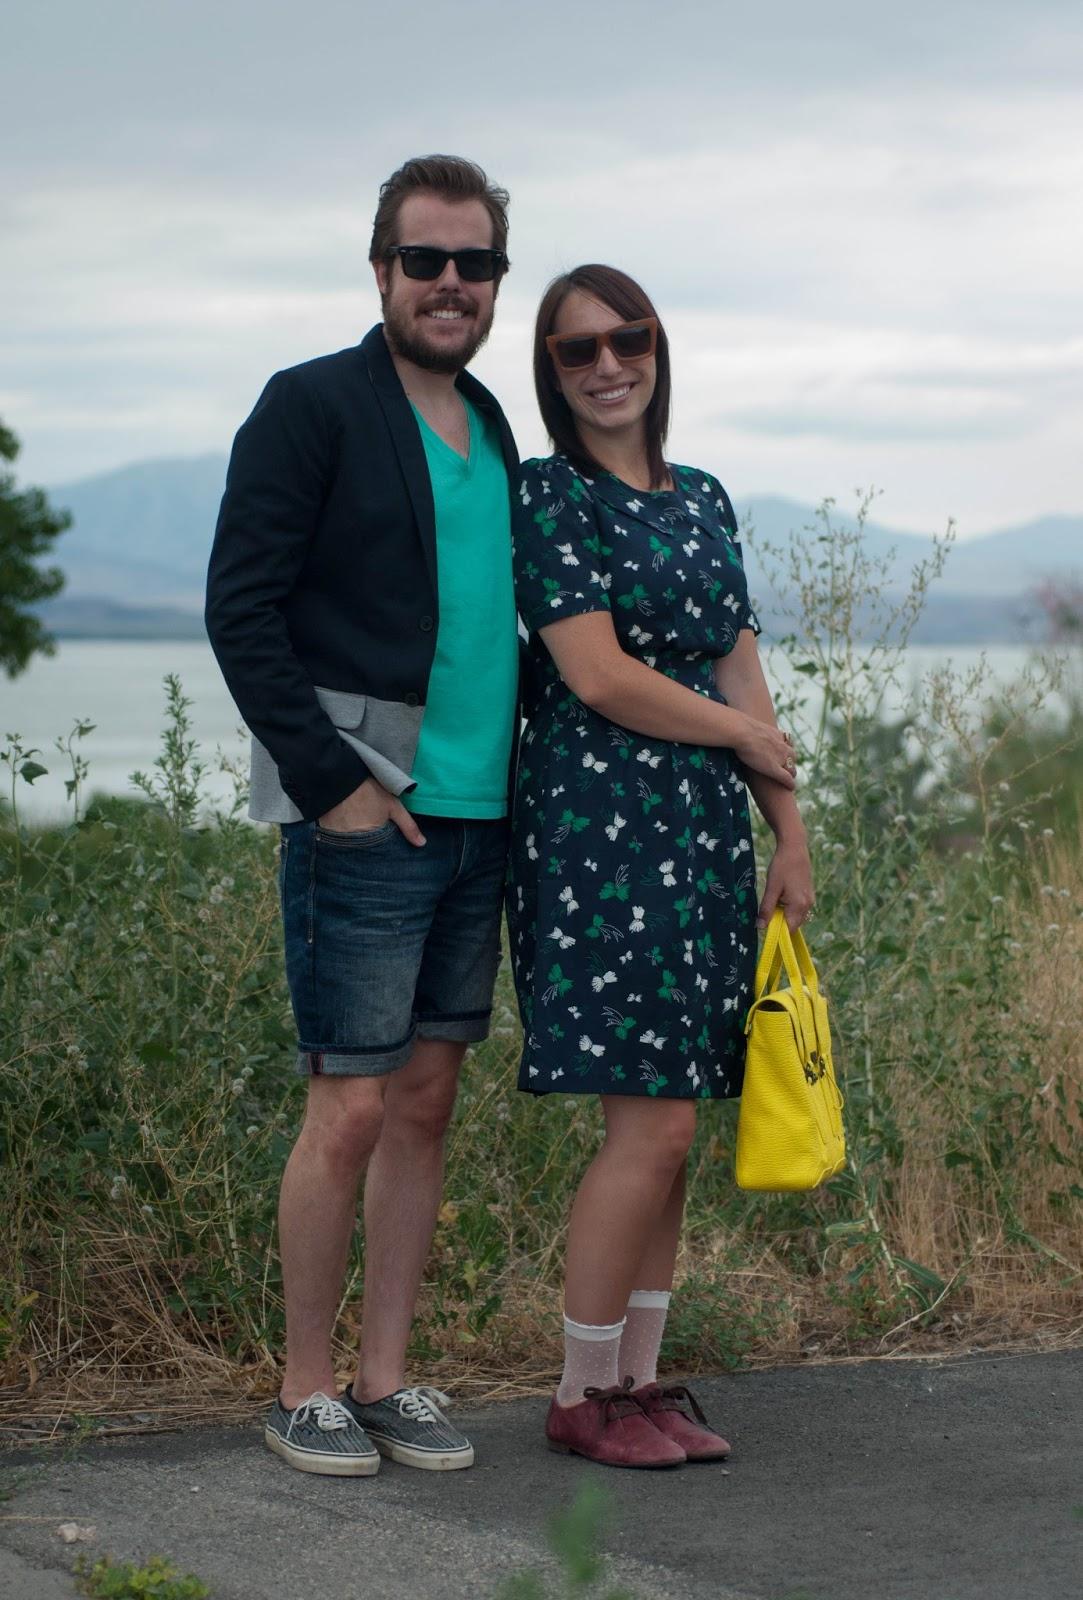 style blog, couples style, ootd, zara, karen walker, karen walker bow dress, karen walker sunglasses, ray ban sunglasses